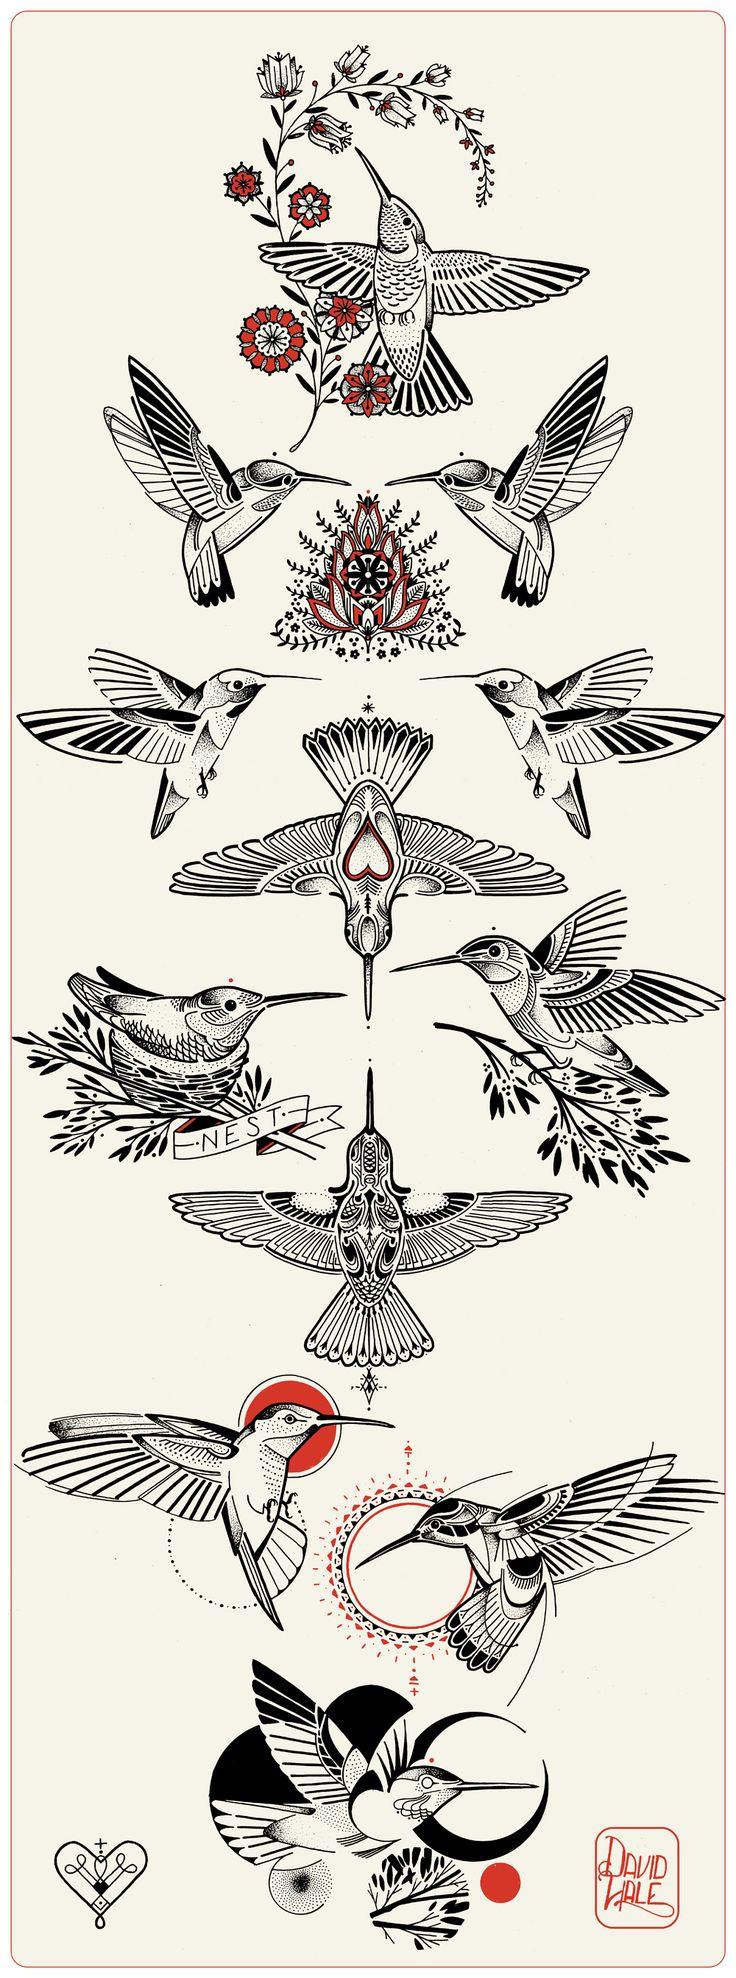 david hale Hummingbirds (symbolism : http://mara-gamiel.blogspot.nl/2009/09/hummingbird-symbolism.html )